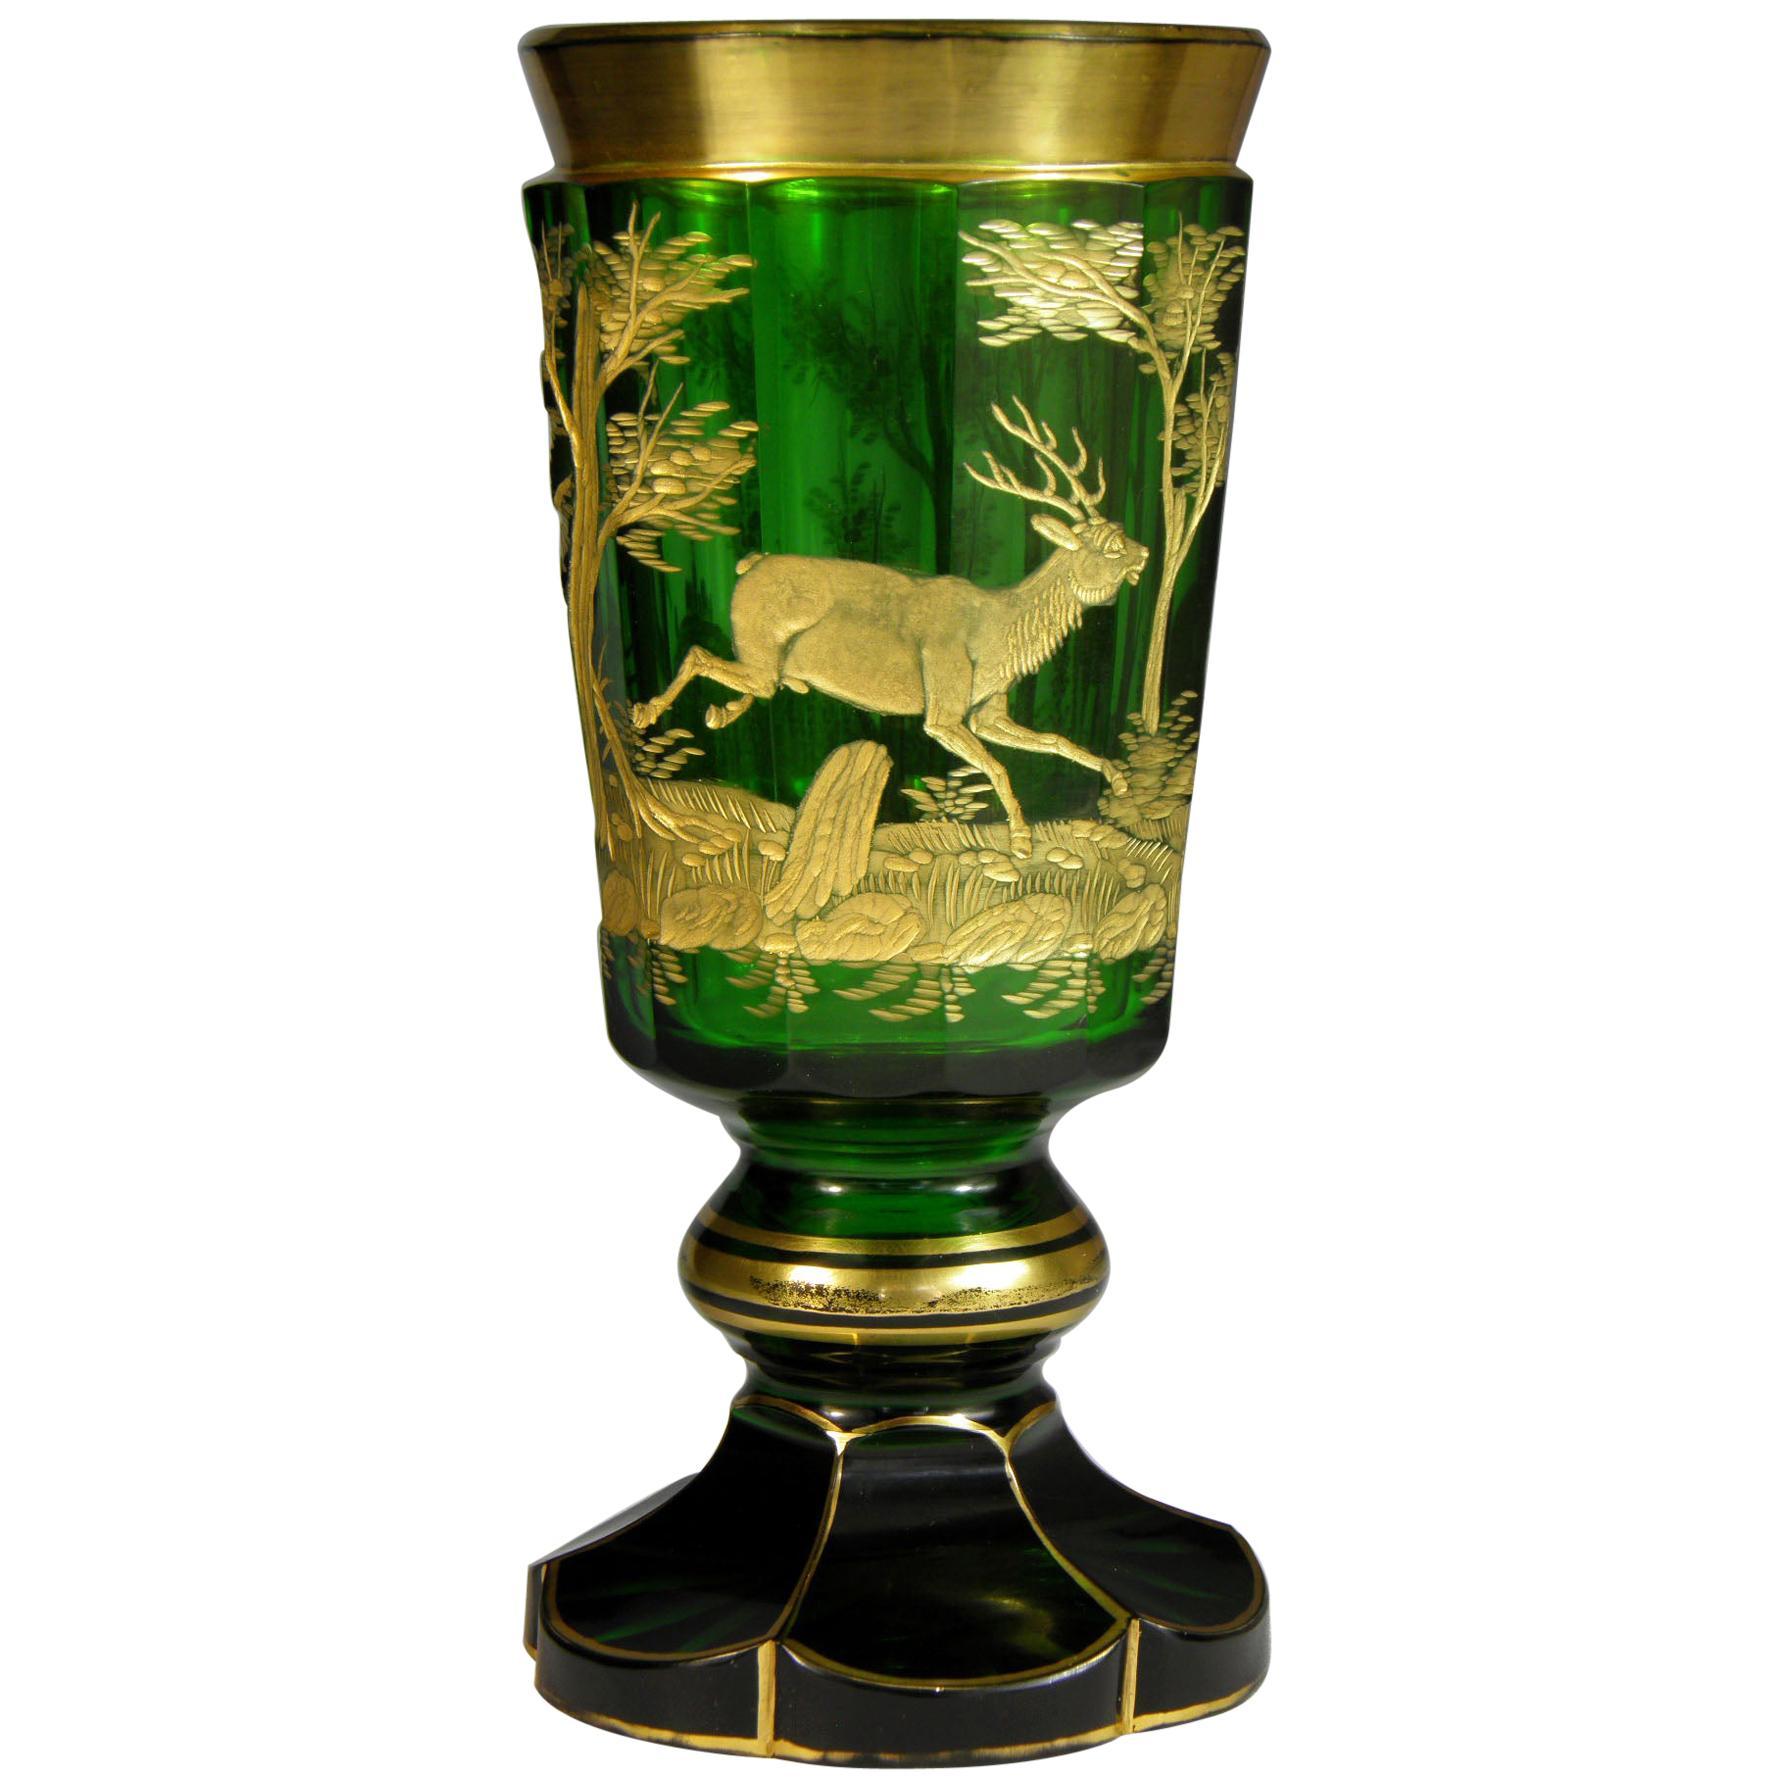 Bohemian European Glass Goblet Hunting Motive, 19th Century